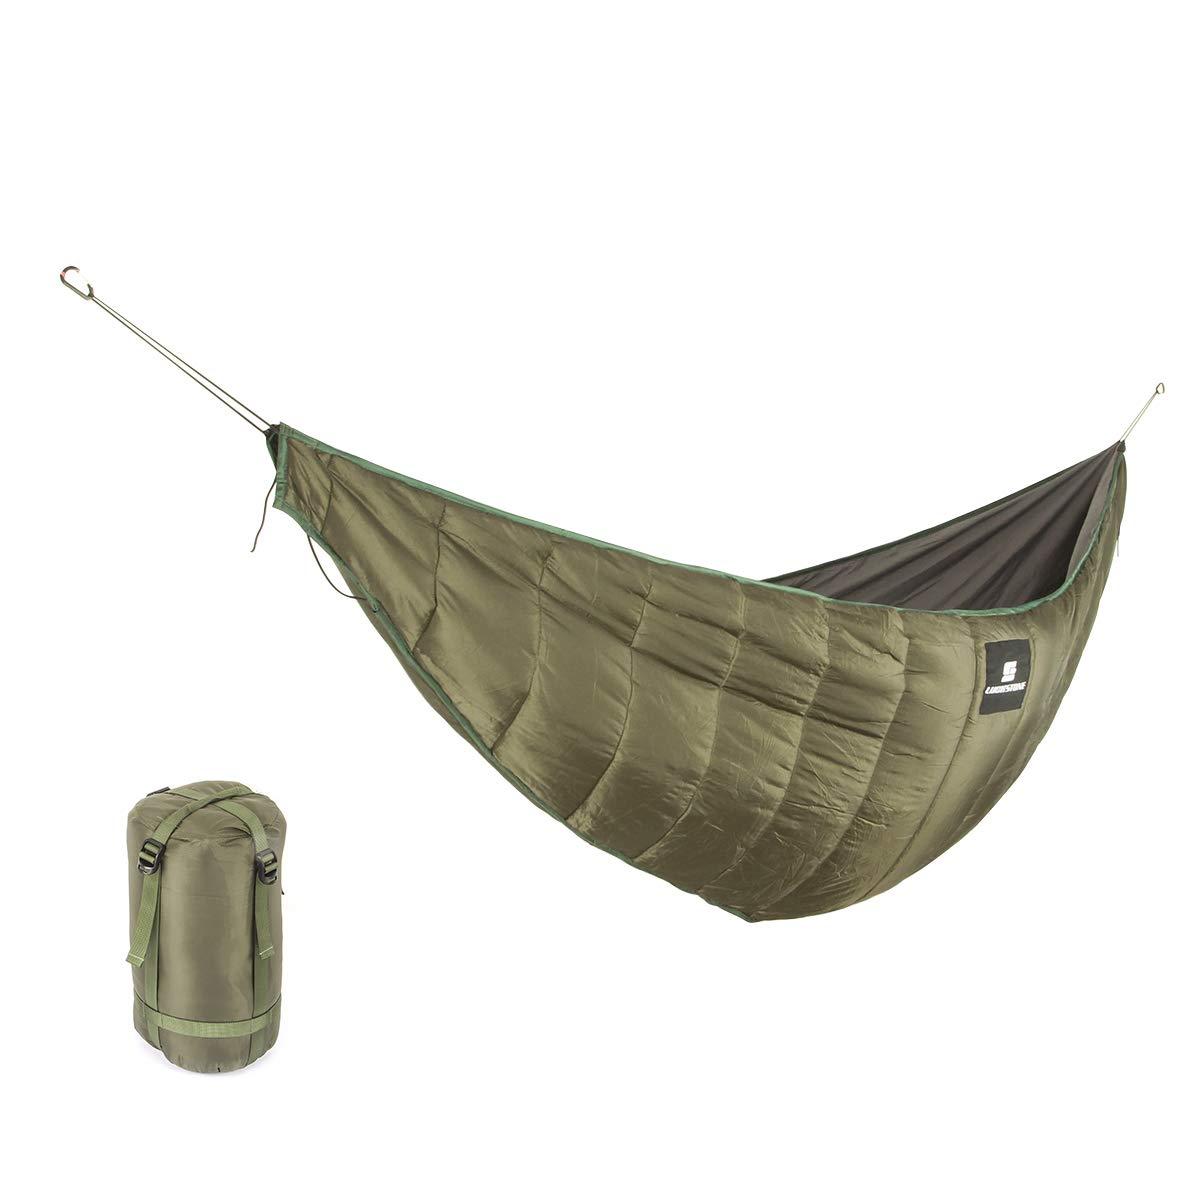 Outdoor Winter Warm Sleeping Bag Hammock Underquilt Sleeping Bag Warmer Under Quilt Blanket For Outdoor Camping Hiking Sports & Entertainment